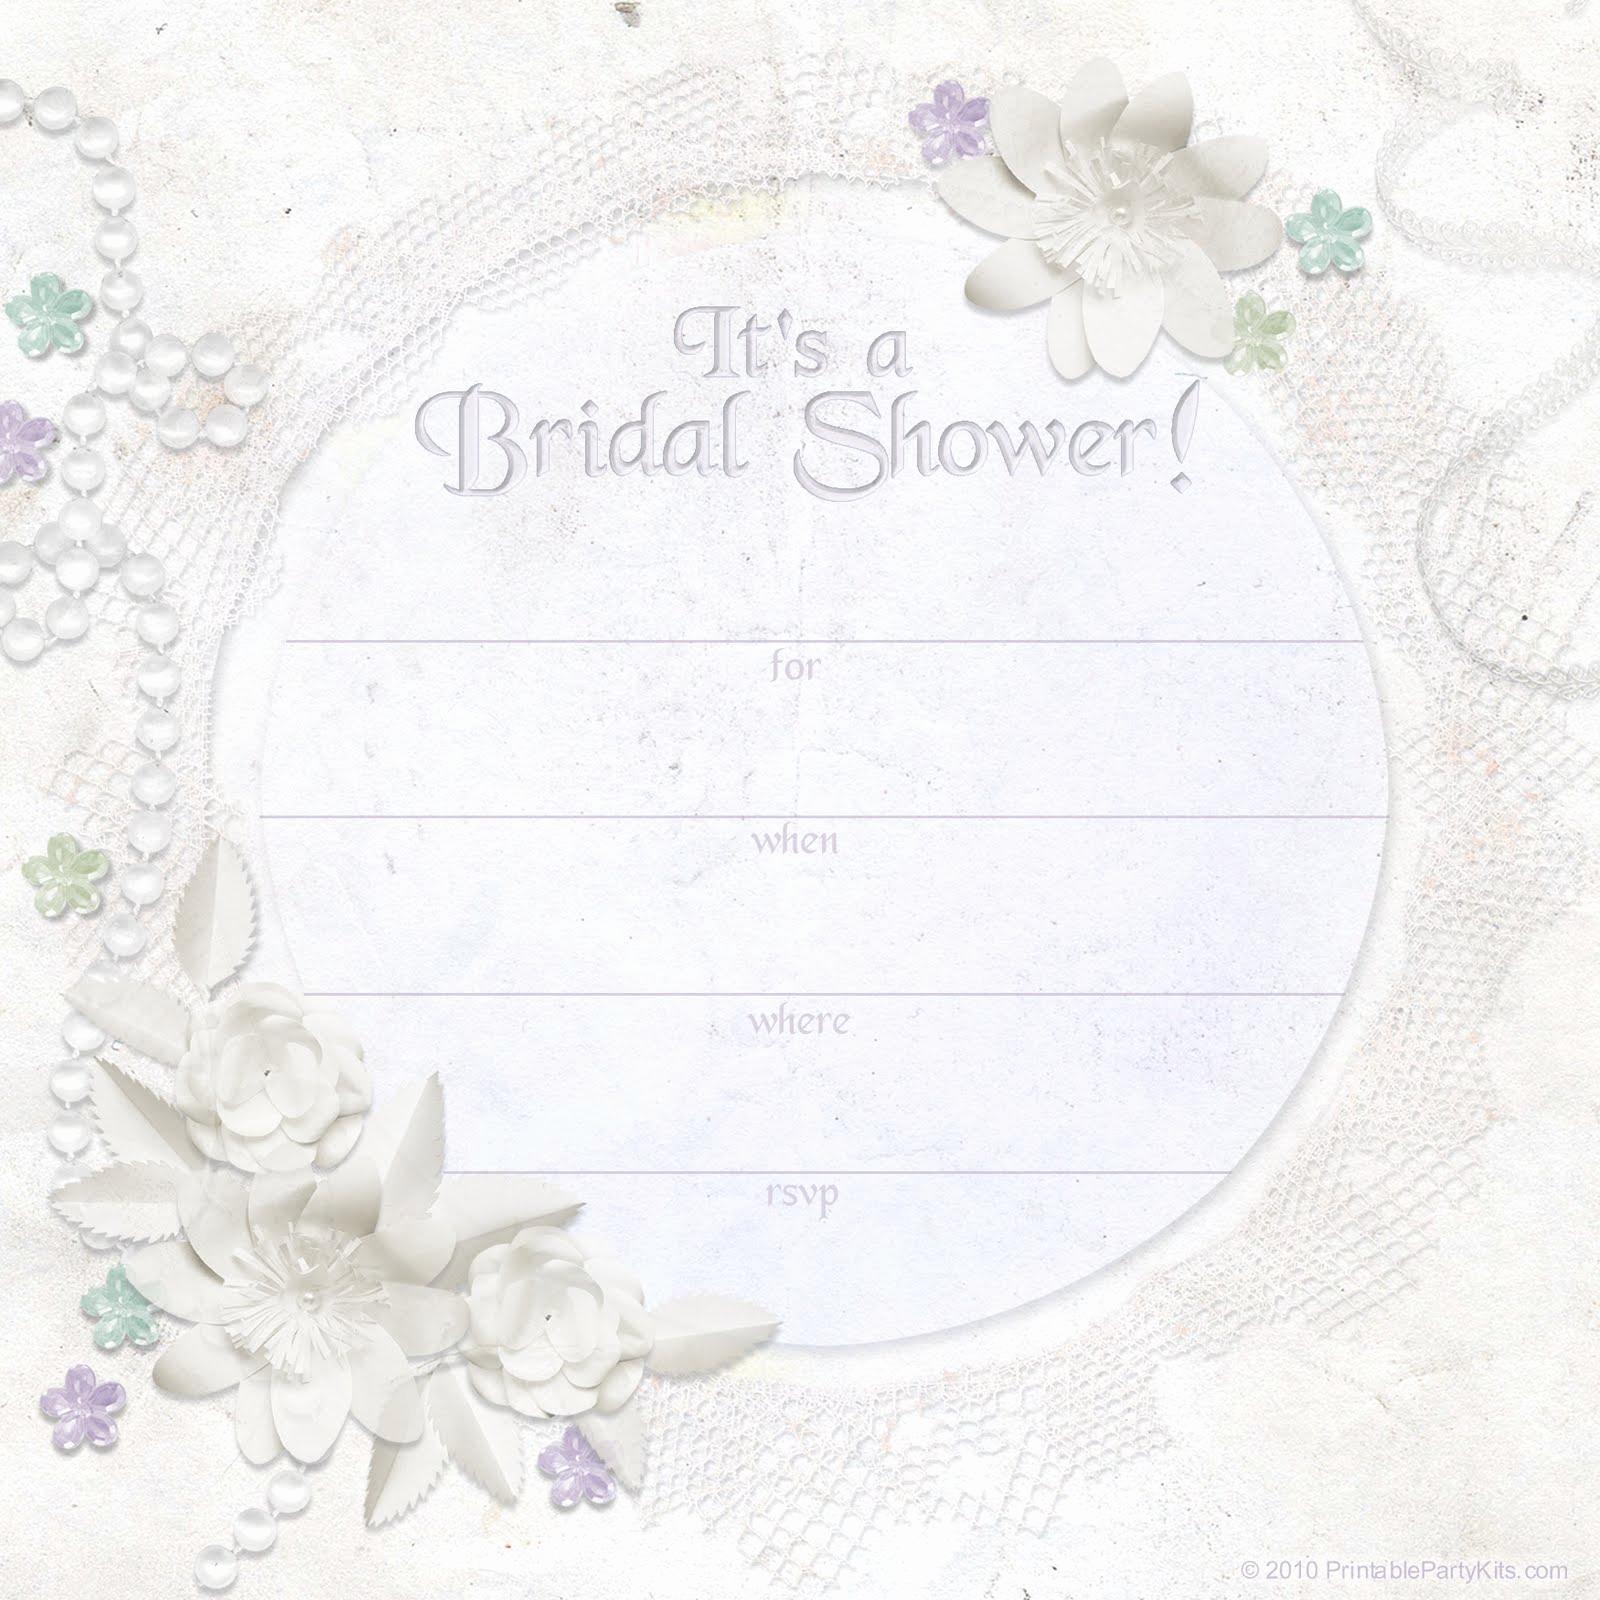 Bridal Shower Invitation Template Beautiful Free Printable Bridal Shower Invitations